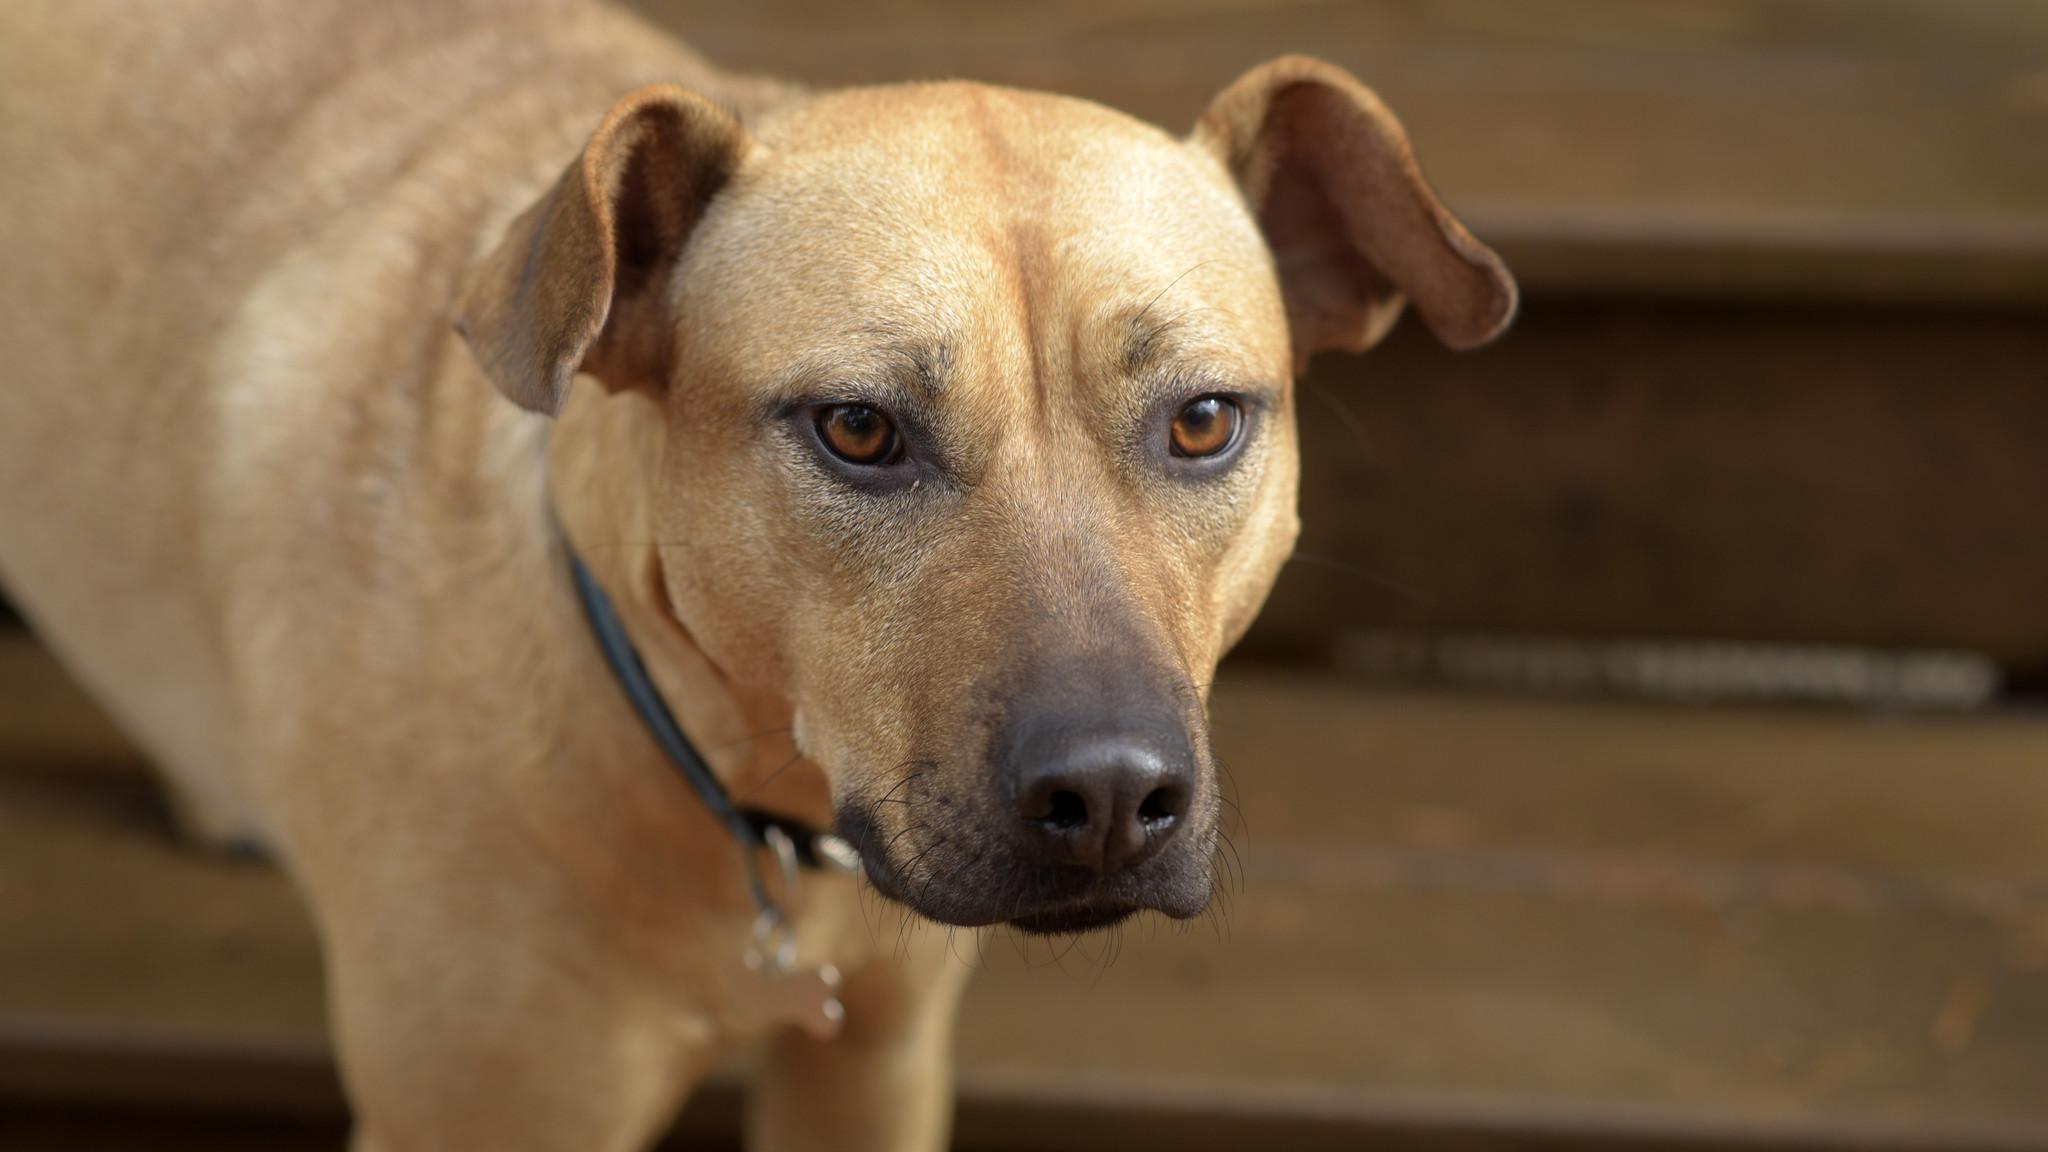 Collared - Baltimore Sun readers' pets - Baltimore Sun